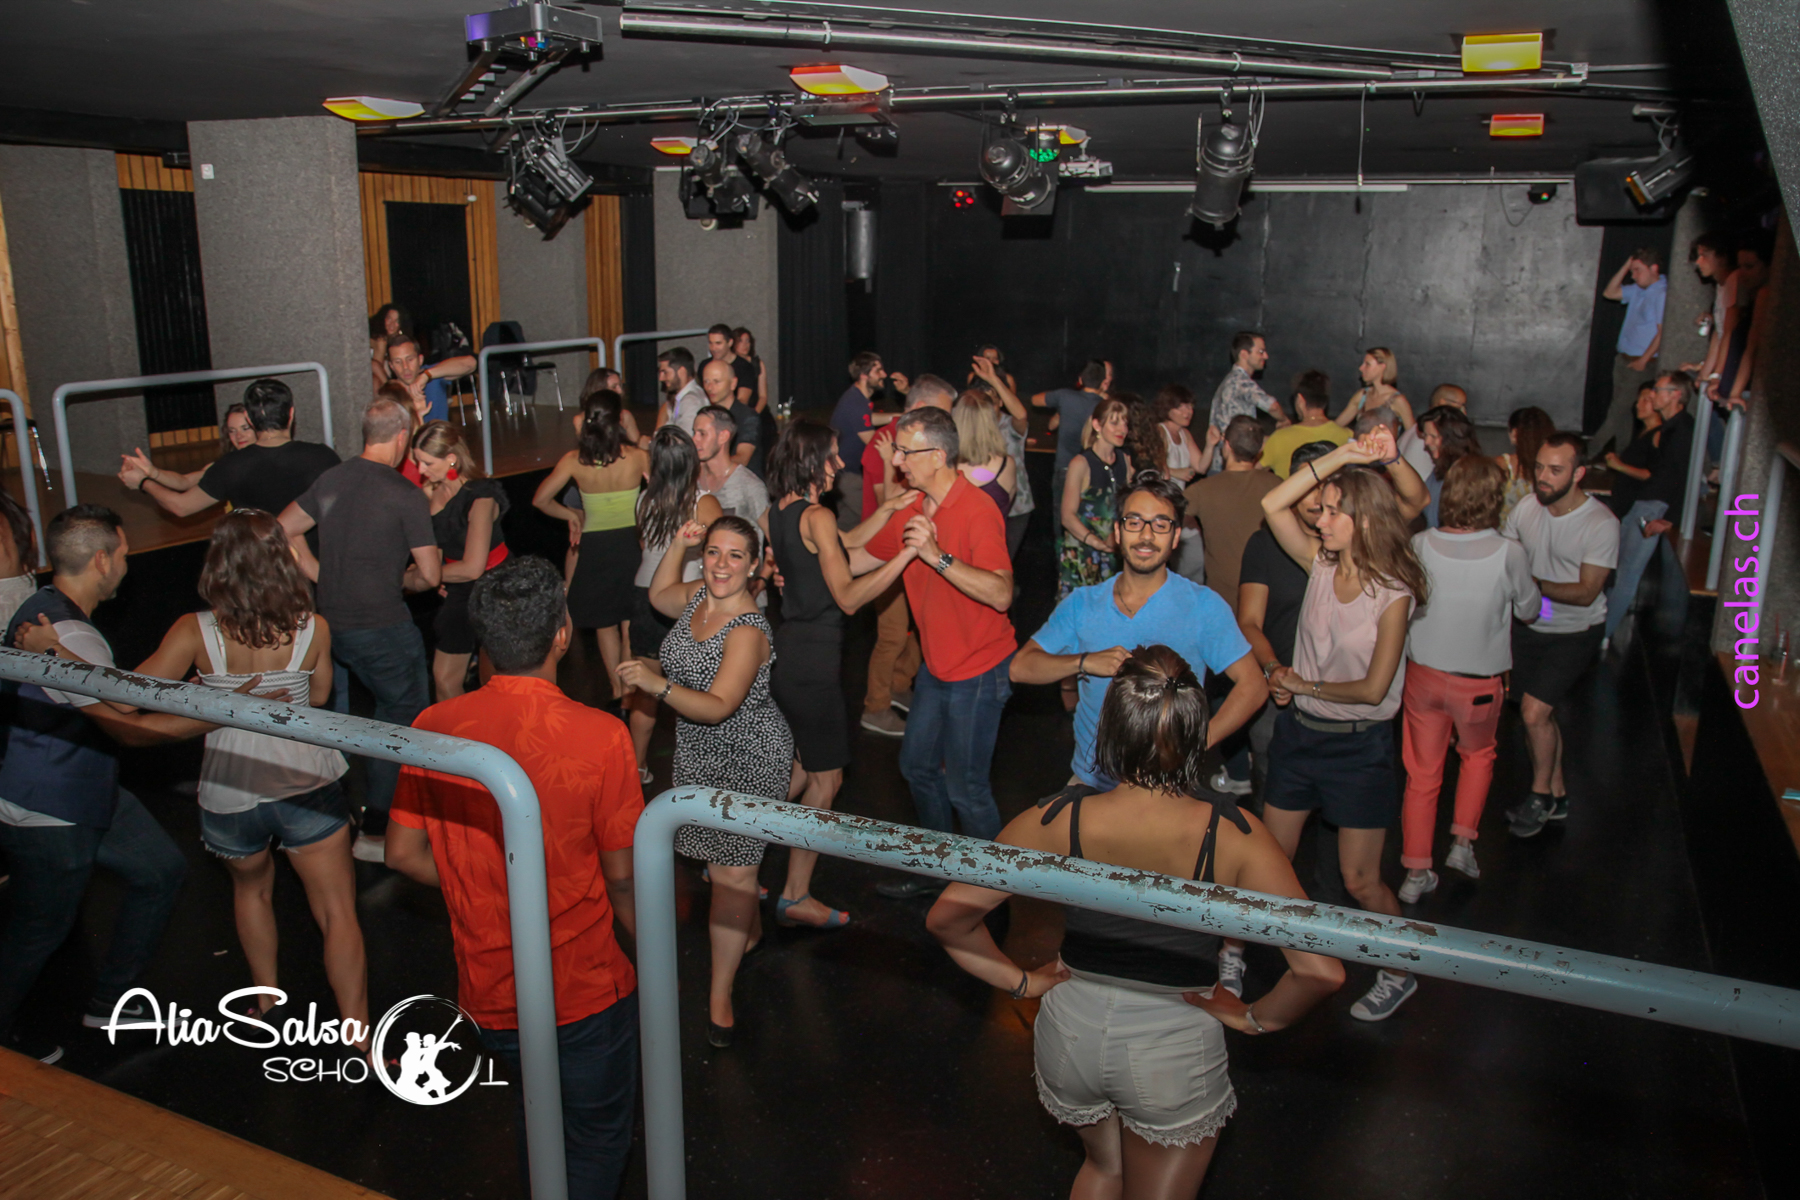 AliaSalsa ecole de danse lausanne soiree bachata salsa cubaineAlia Salsa Soireé Salsa - Bachata-44